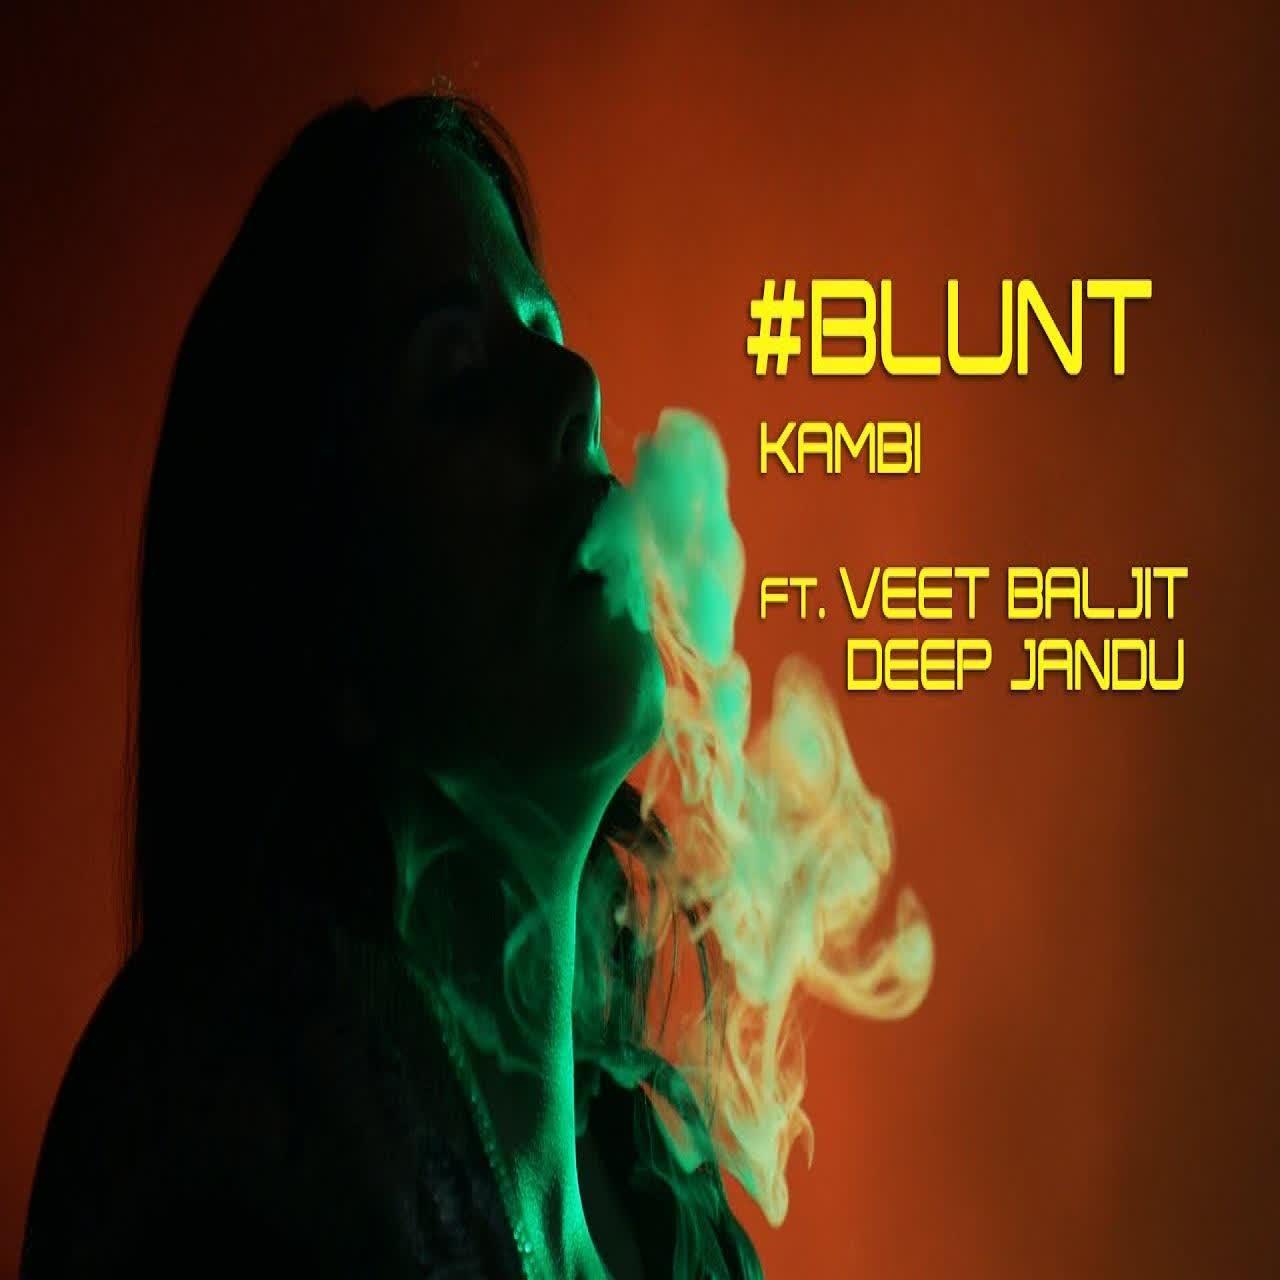 Blunt Kambi